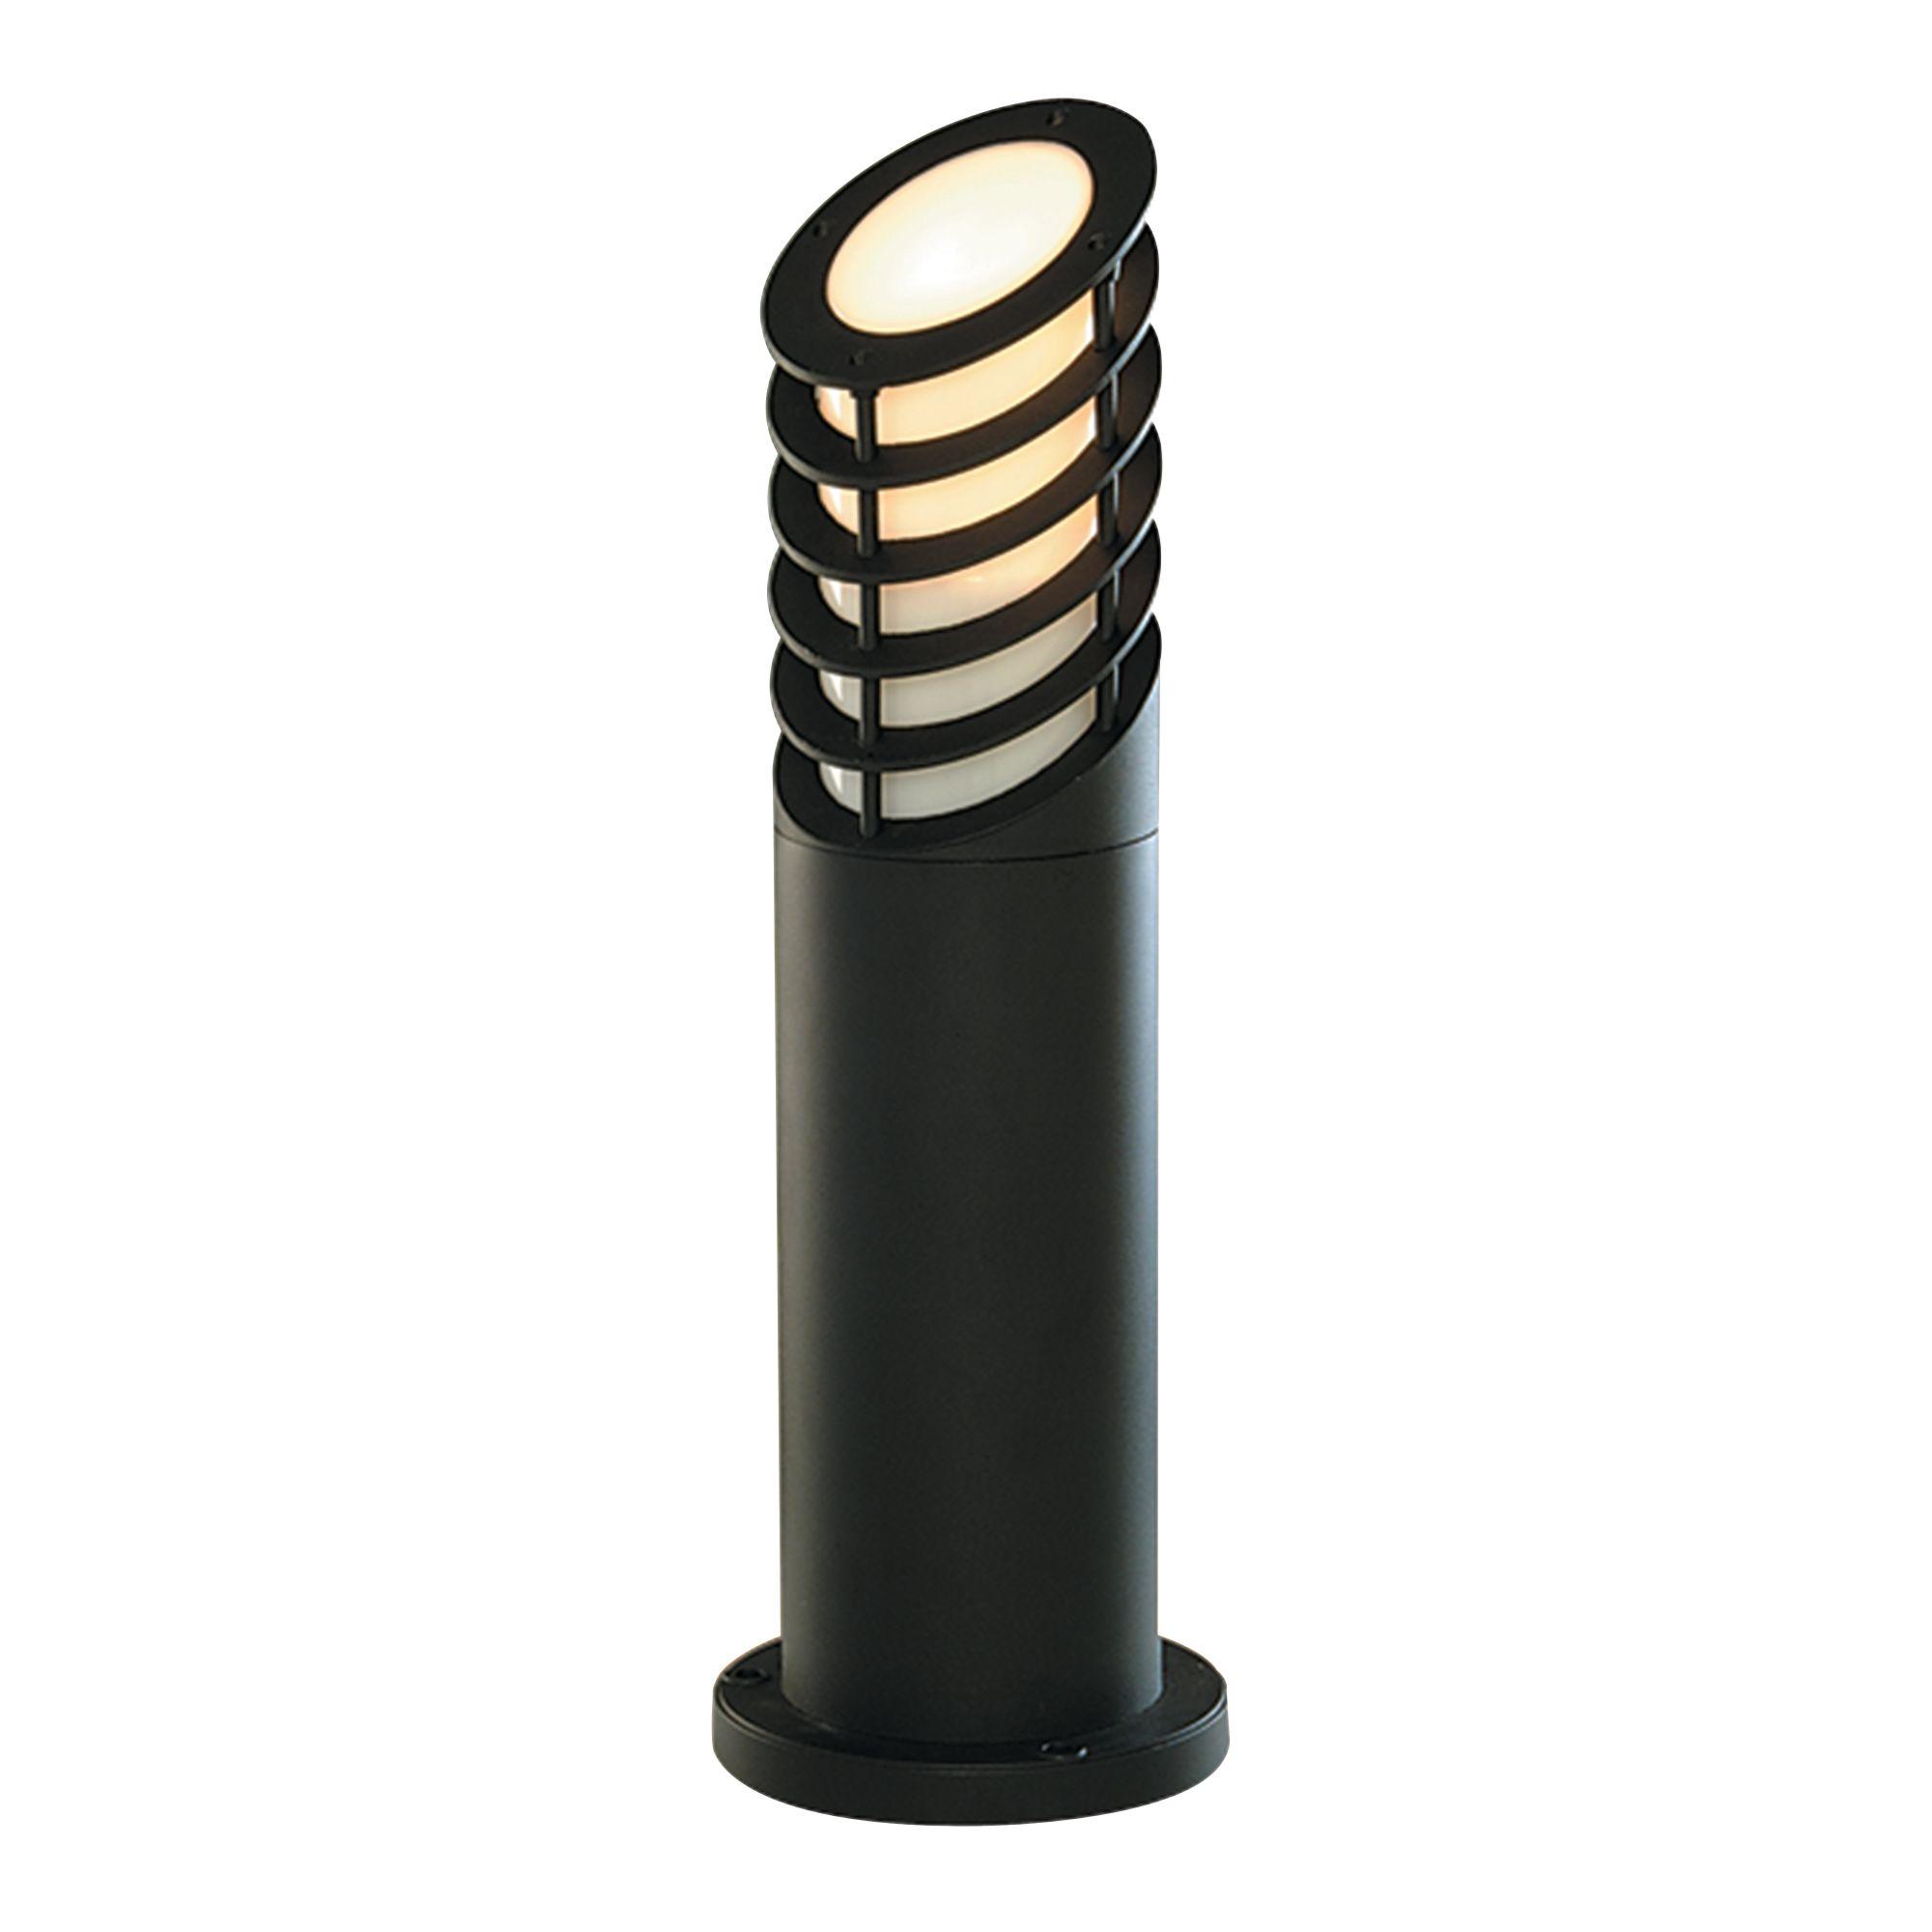 Die Cast Aluminium Ip44 Black Bollard Light With White Polycarbonate Diffuser